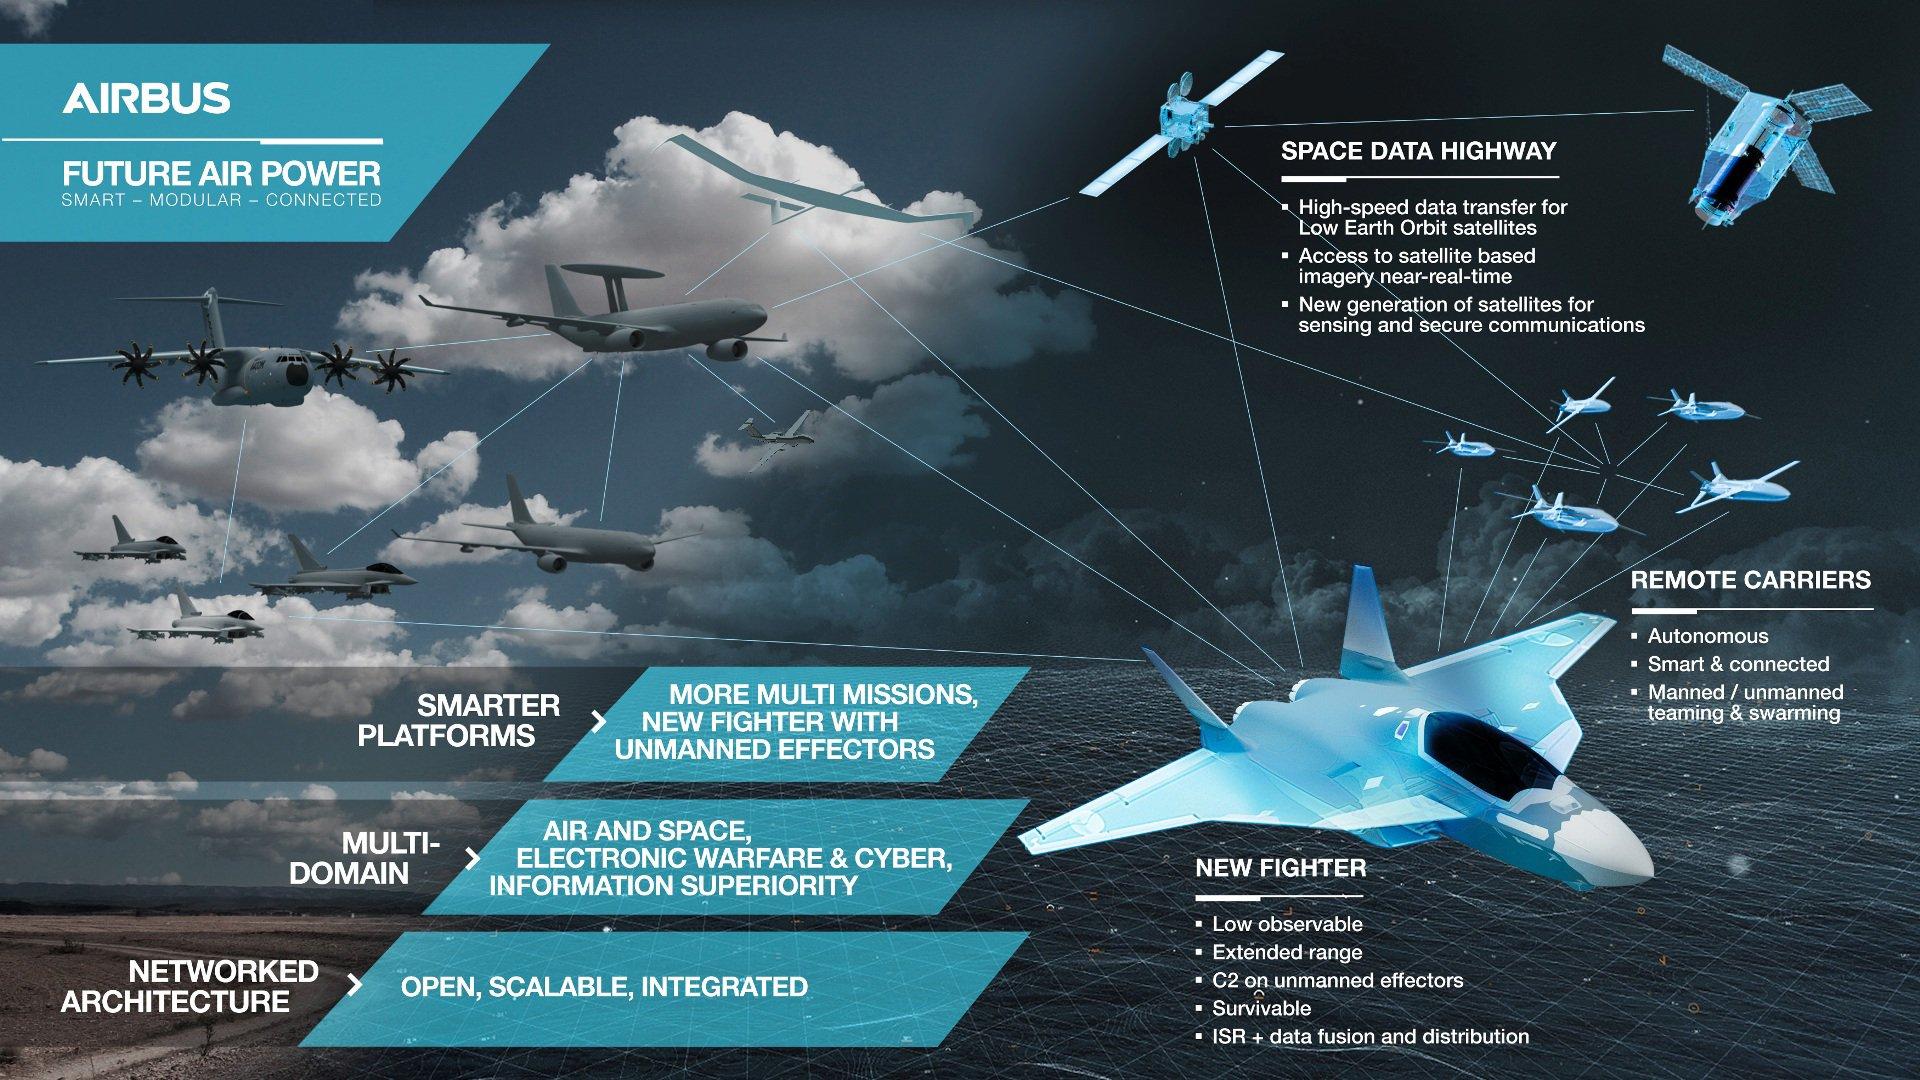 FutureAirPower